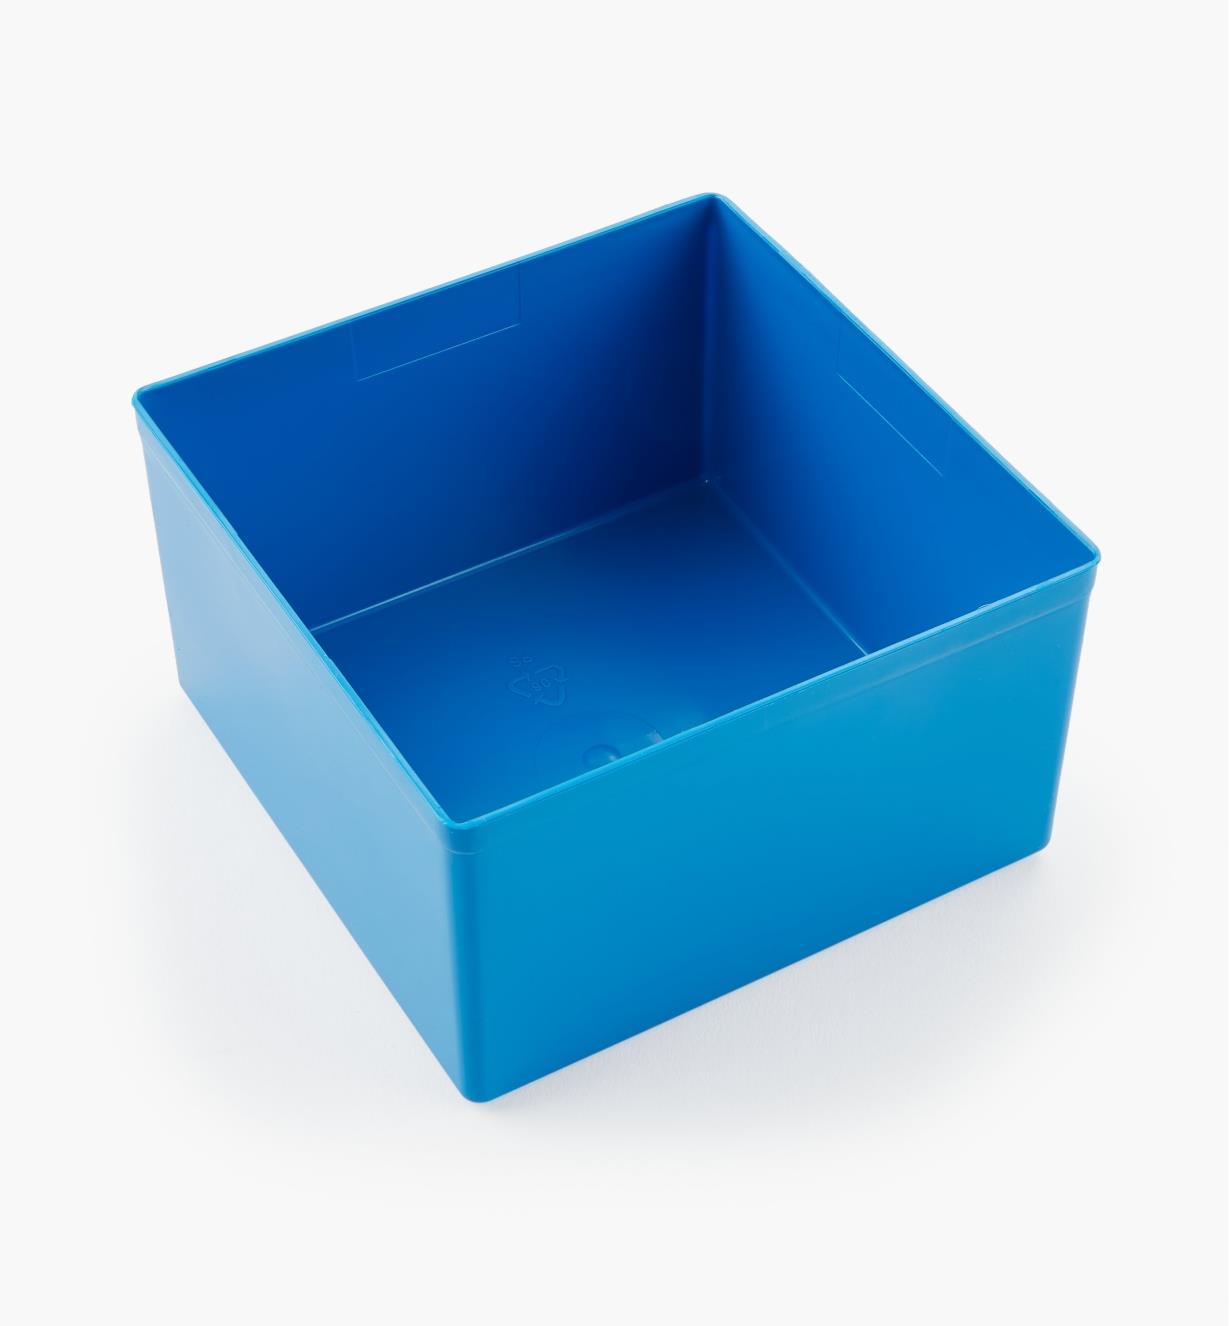 27K8023 - Godet bleu de 62 mm x 105 mm x 105 mm (2 7/16 po x 4 1/8 po x 4 1/8 po), l'unité